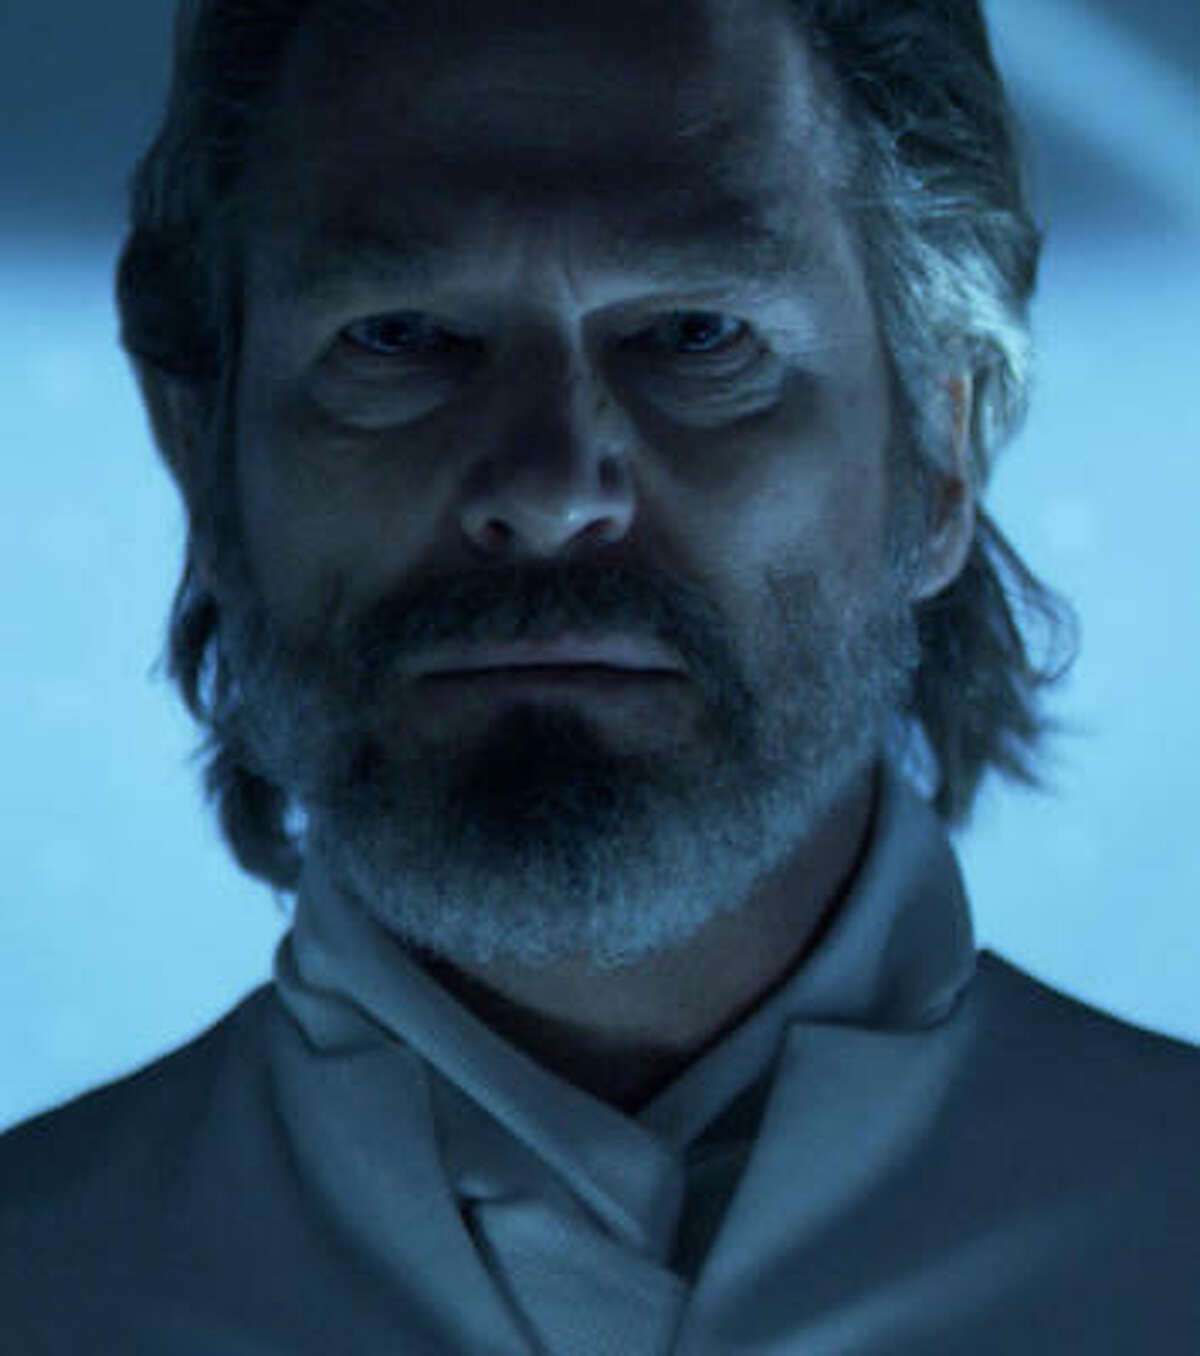 Tron:Legacy , $20.1 million: A virtual-world worker looks to take down the Master Control Program. Starring Jeff Bridges.